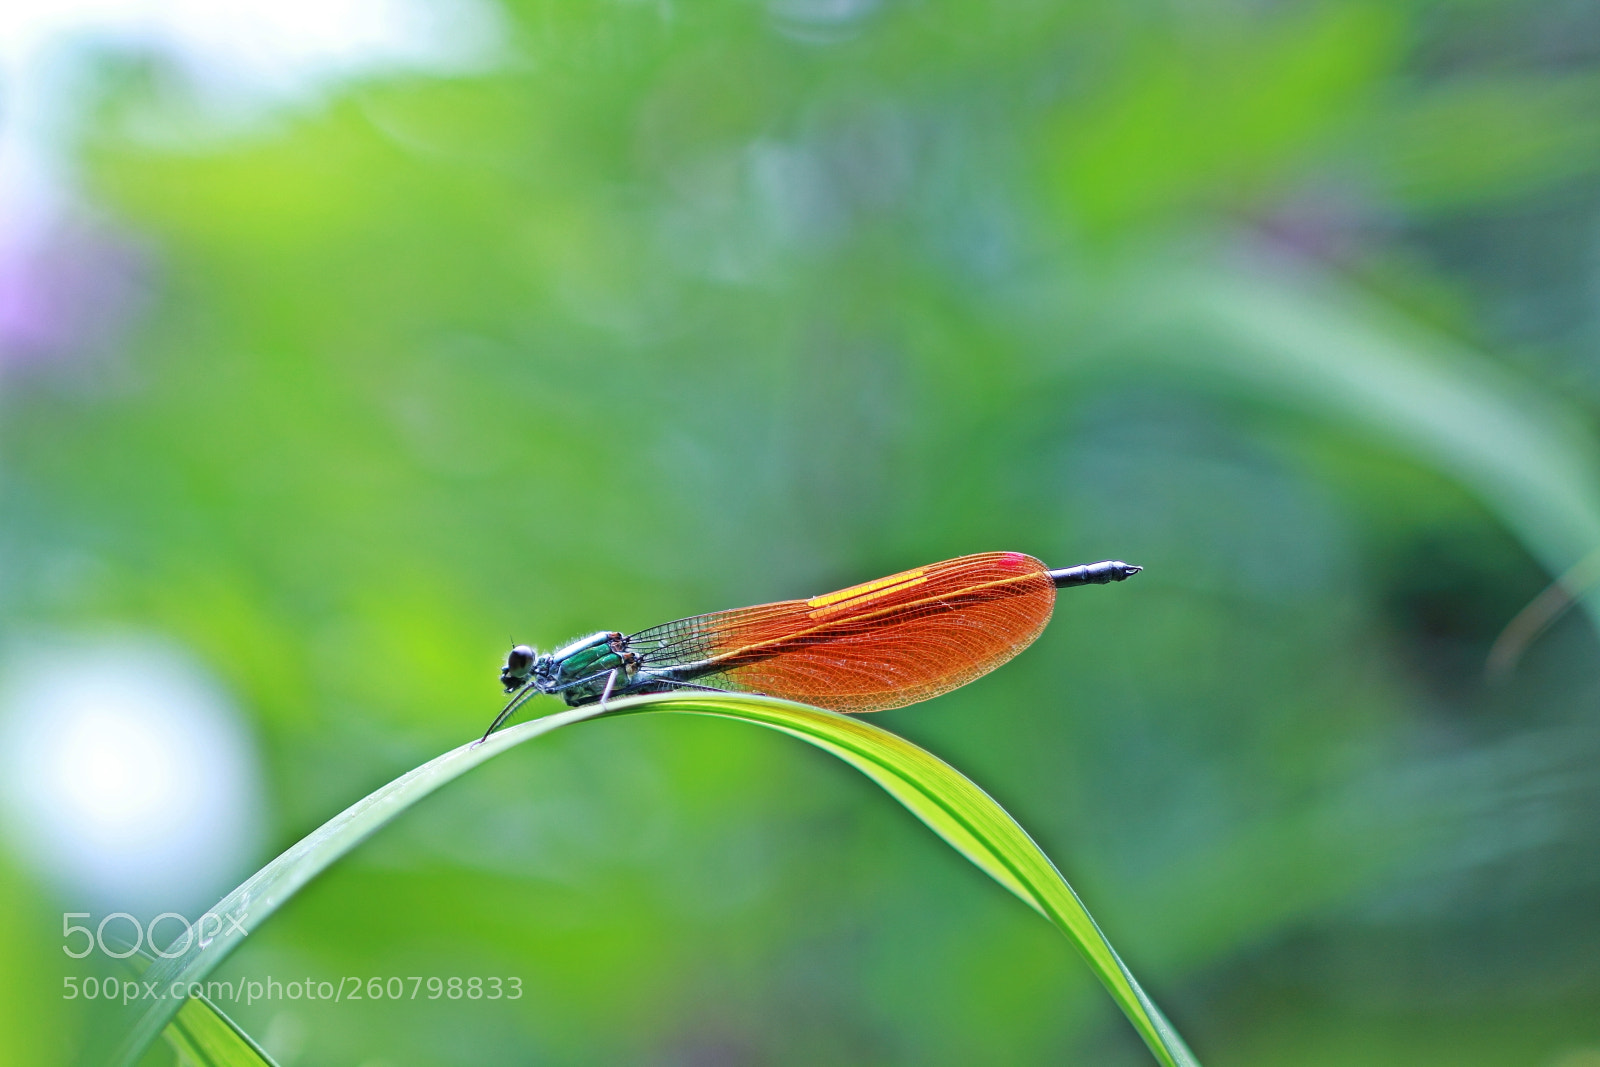 Summer Color, Canon EOS 60D, Canon EF 100mm f/2.8 Macro